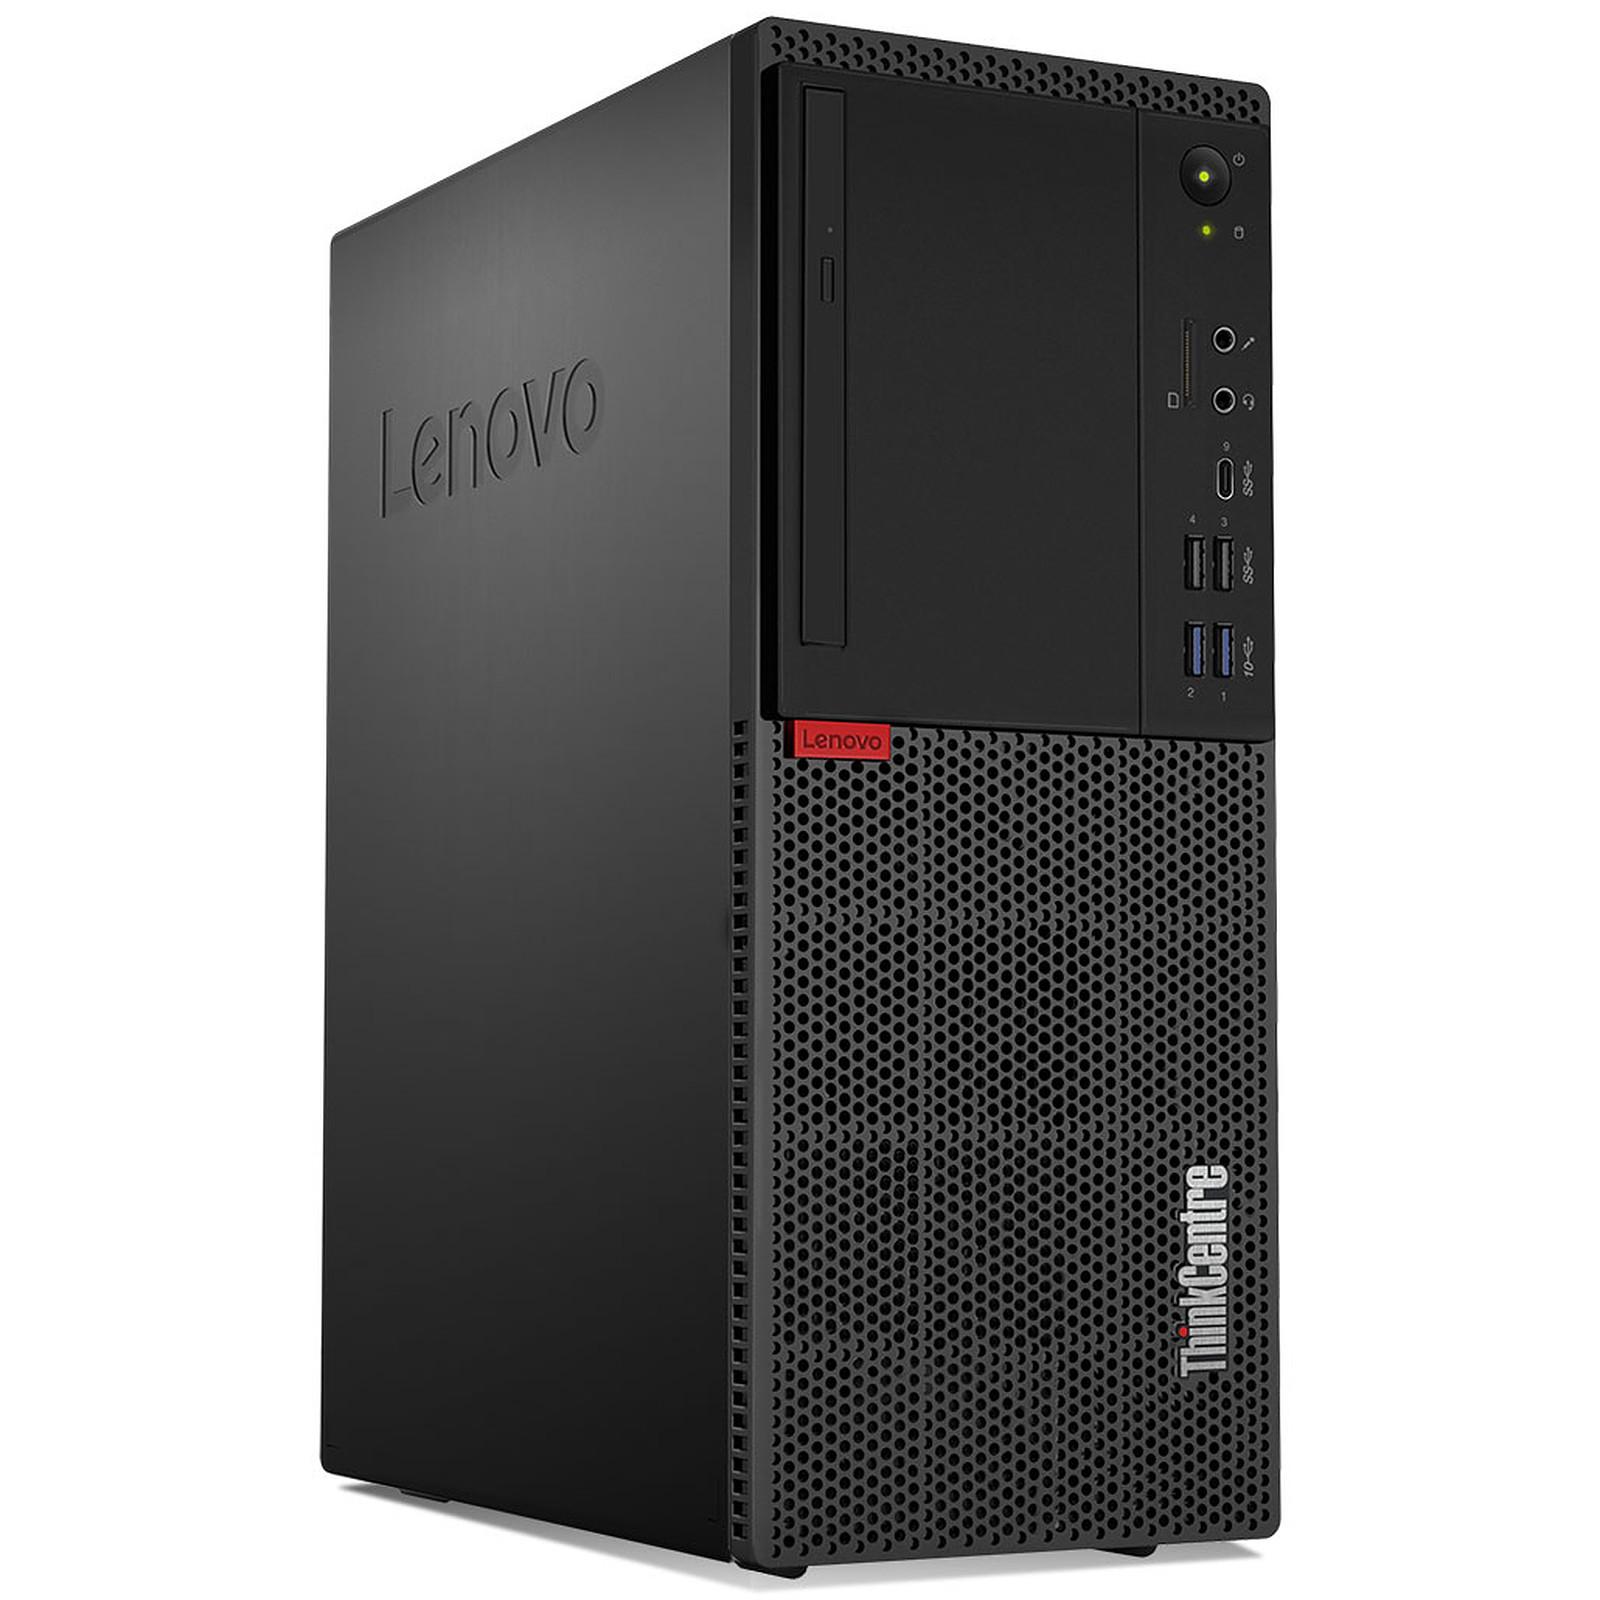 Lenovo ThinkCentre M720t Tour (10SQ002LFR)